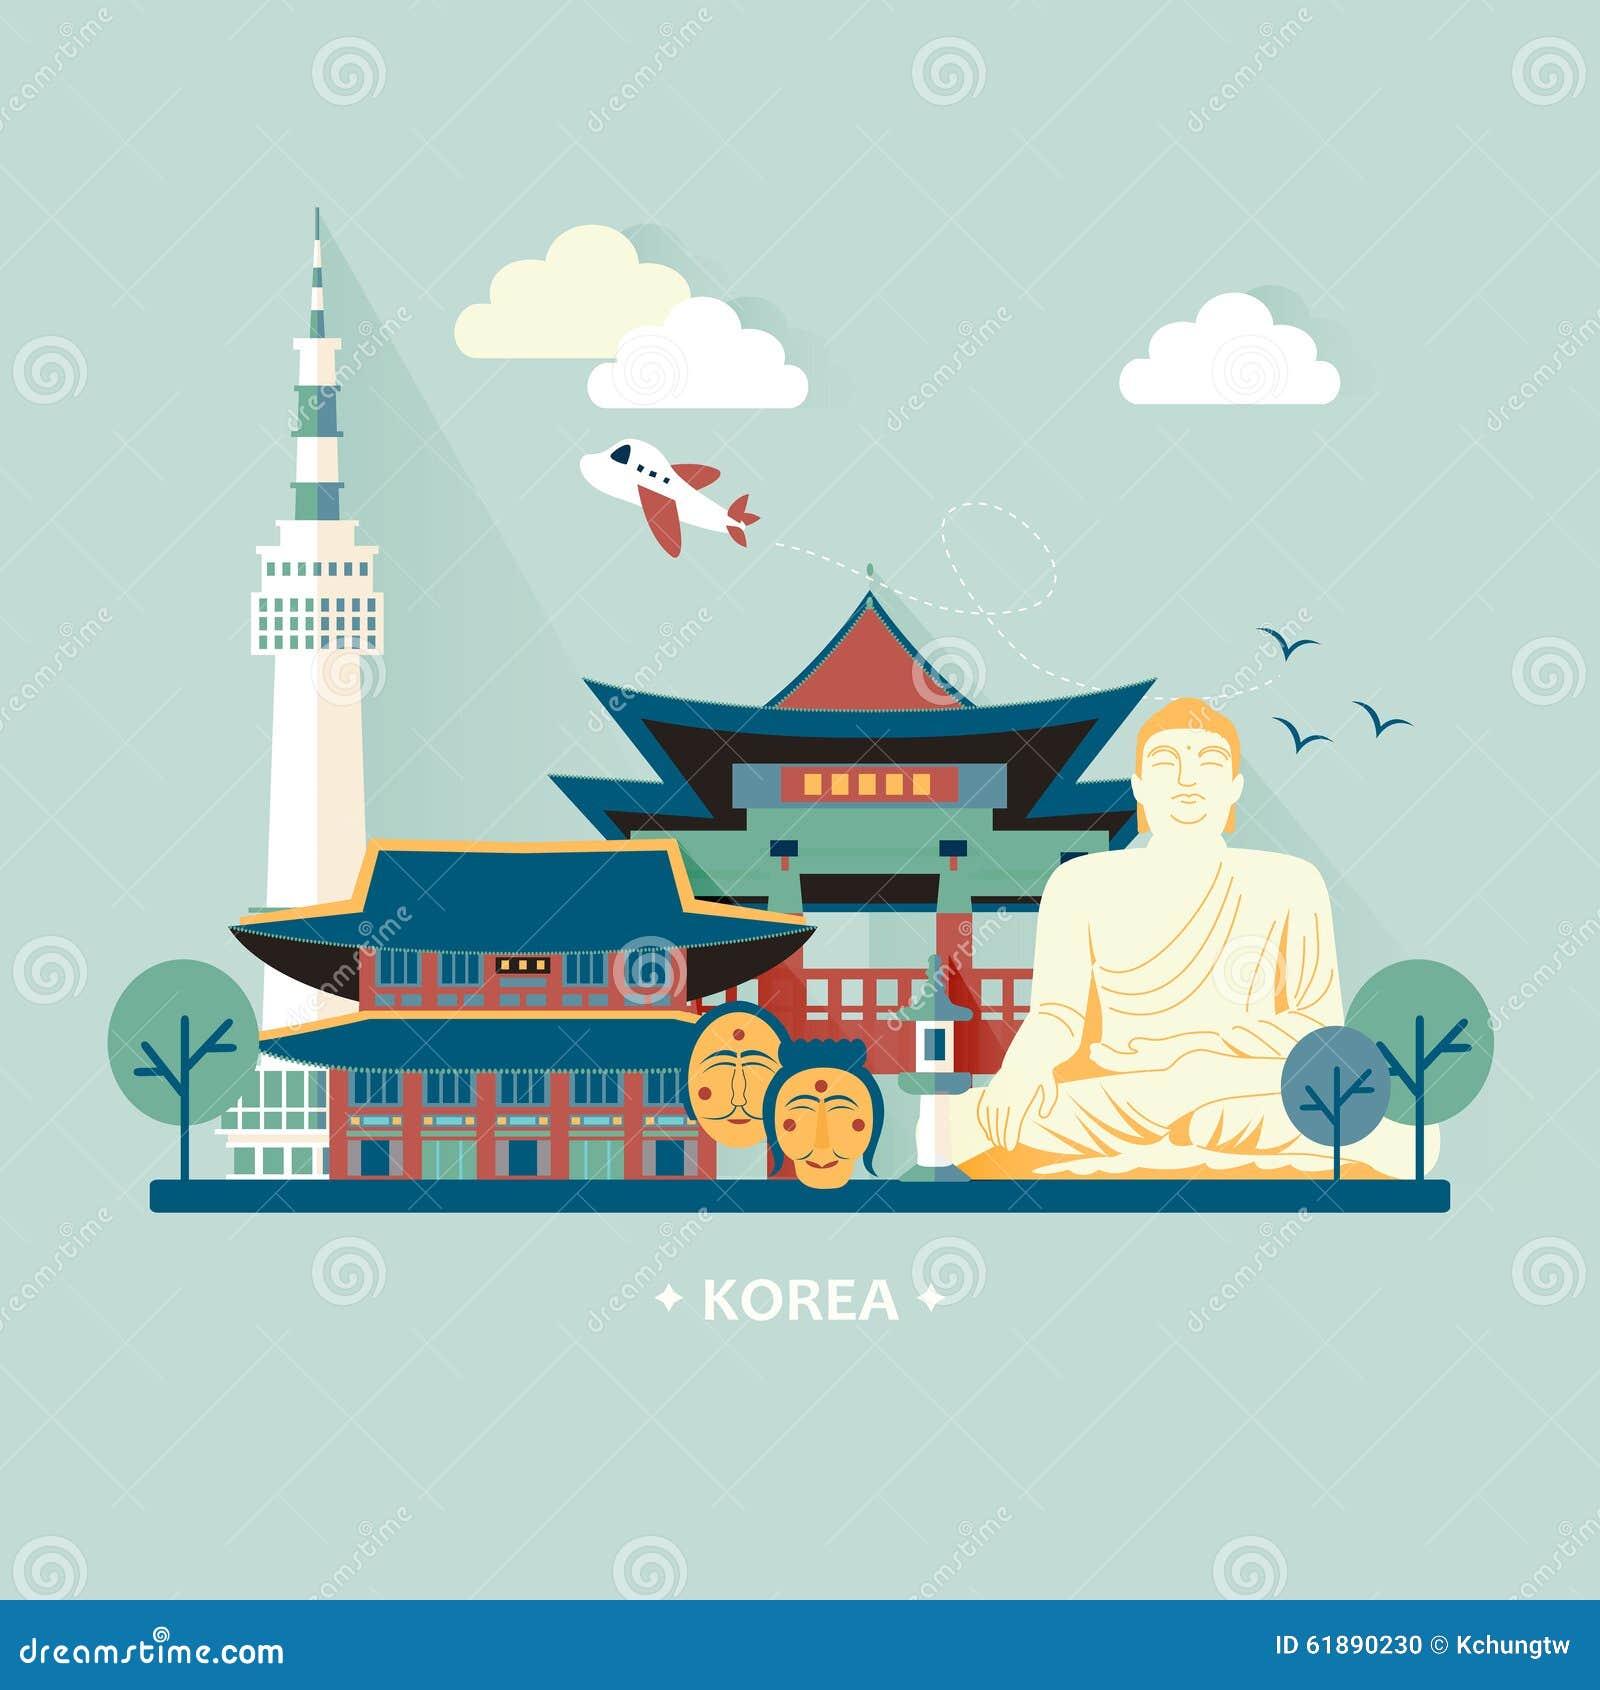 South Korea Travel Concept Stock Illustration